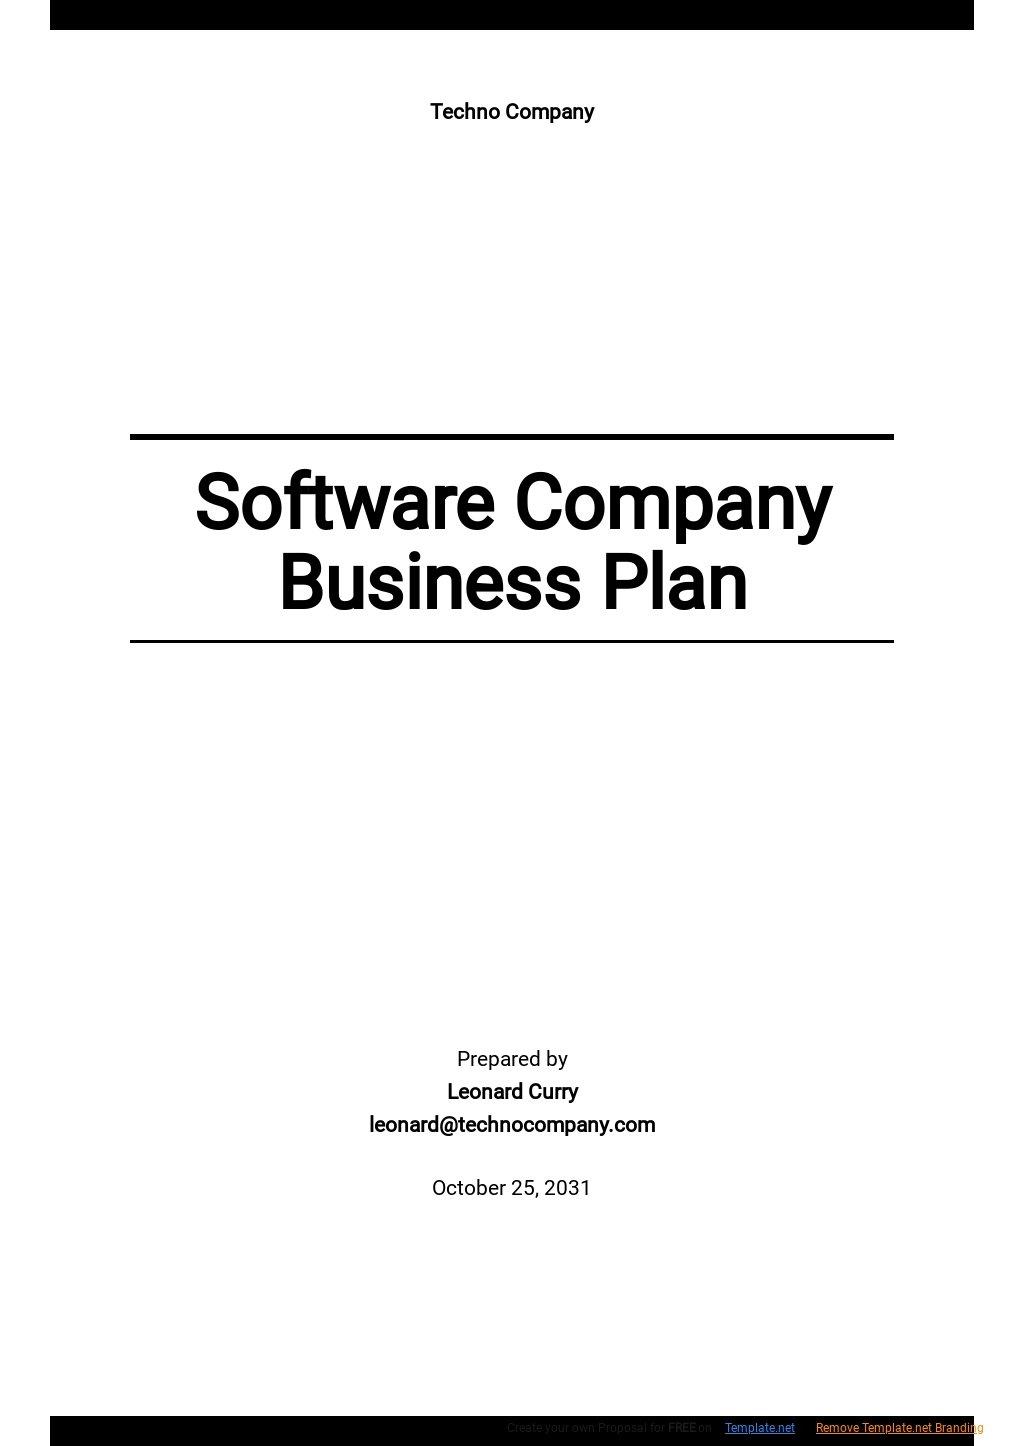 Software Company Business Plan Template.jpe